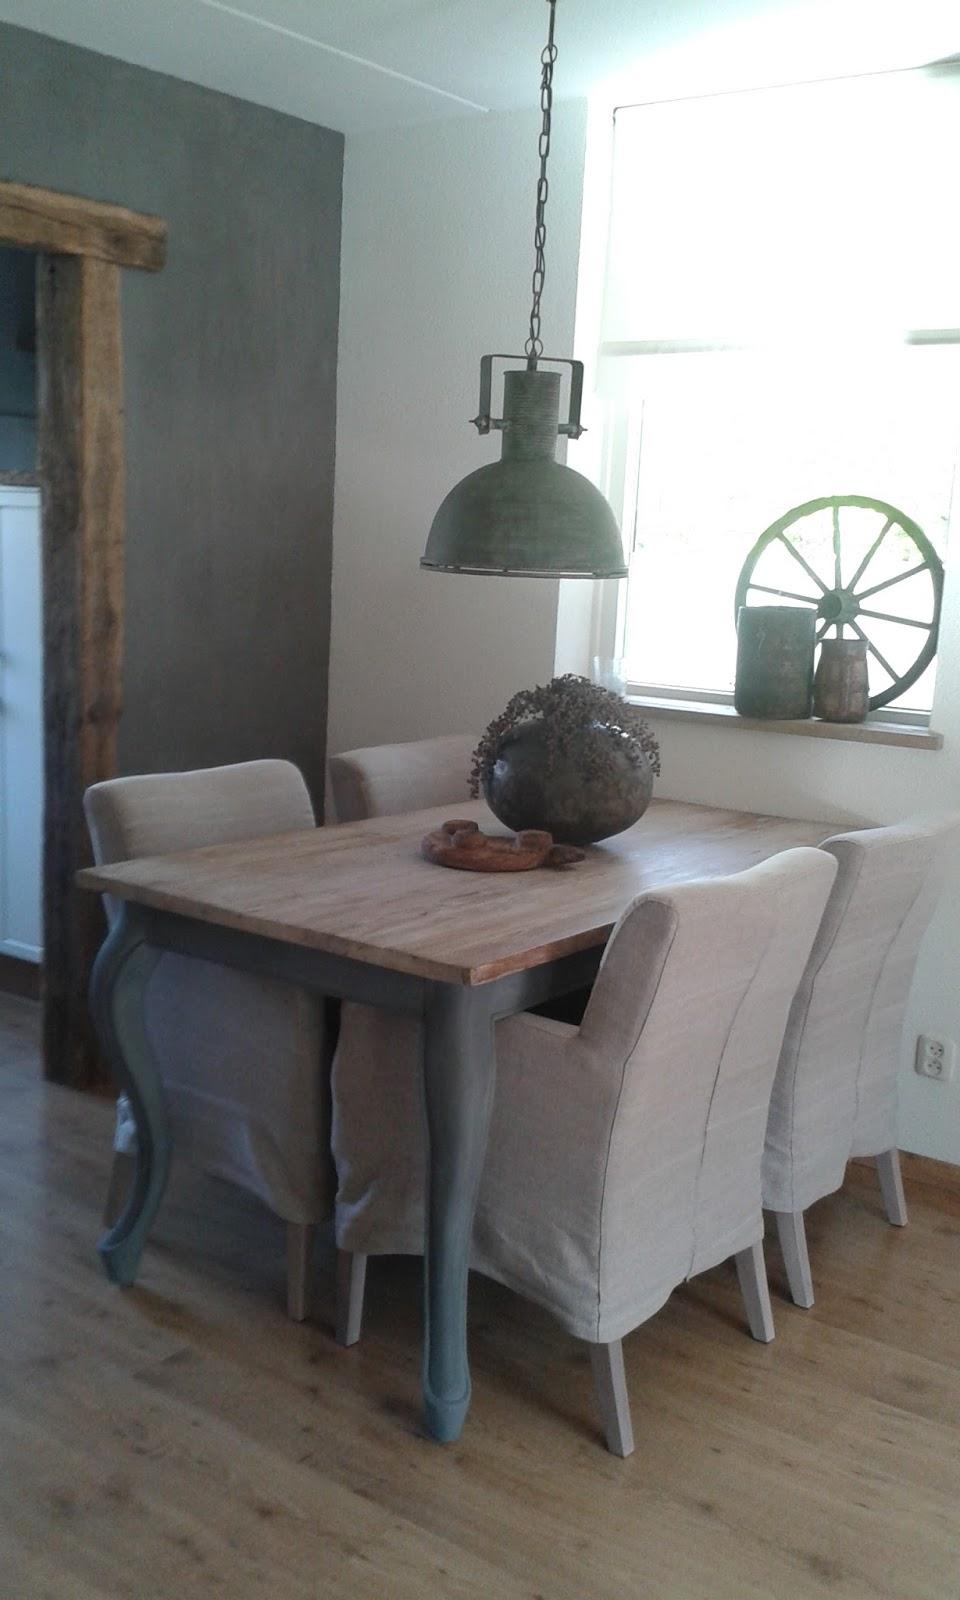 Wonen in je eigen stijl nieuwe eetkamer stoelen - Kamer kleur man ...